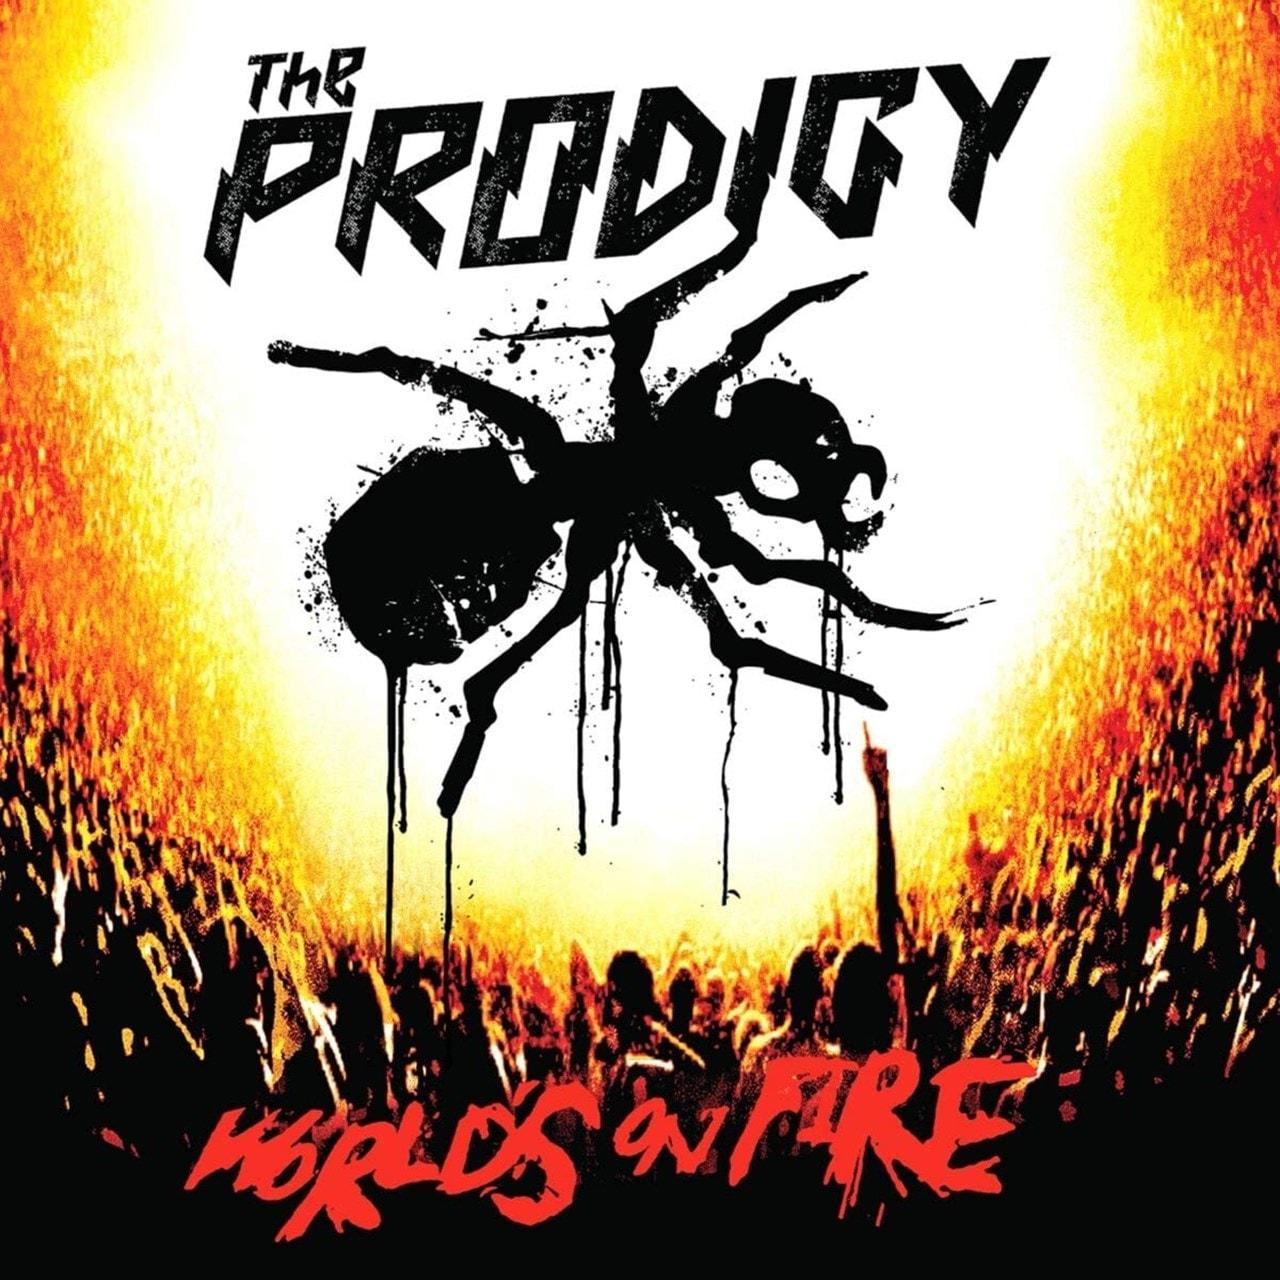 World's On Fire - 1